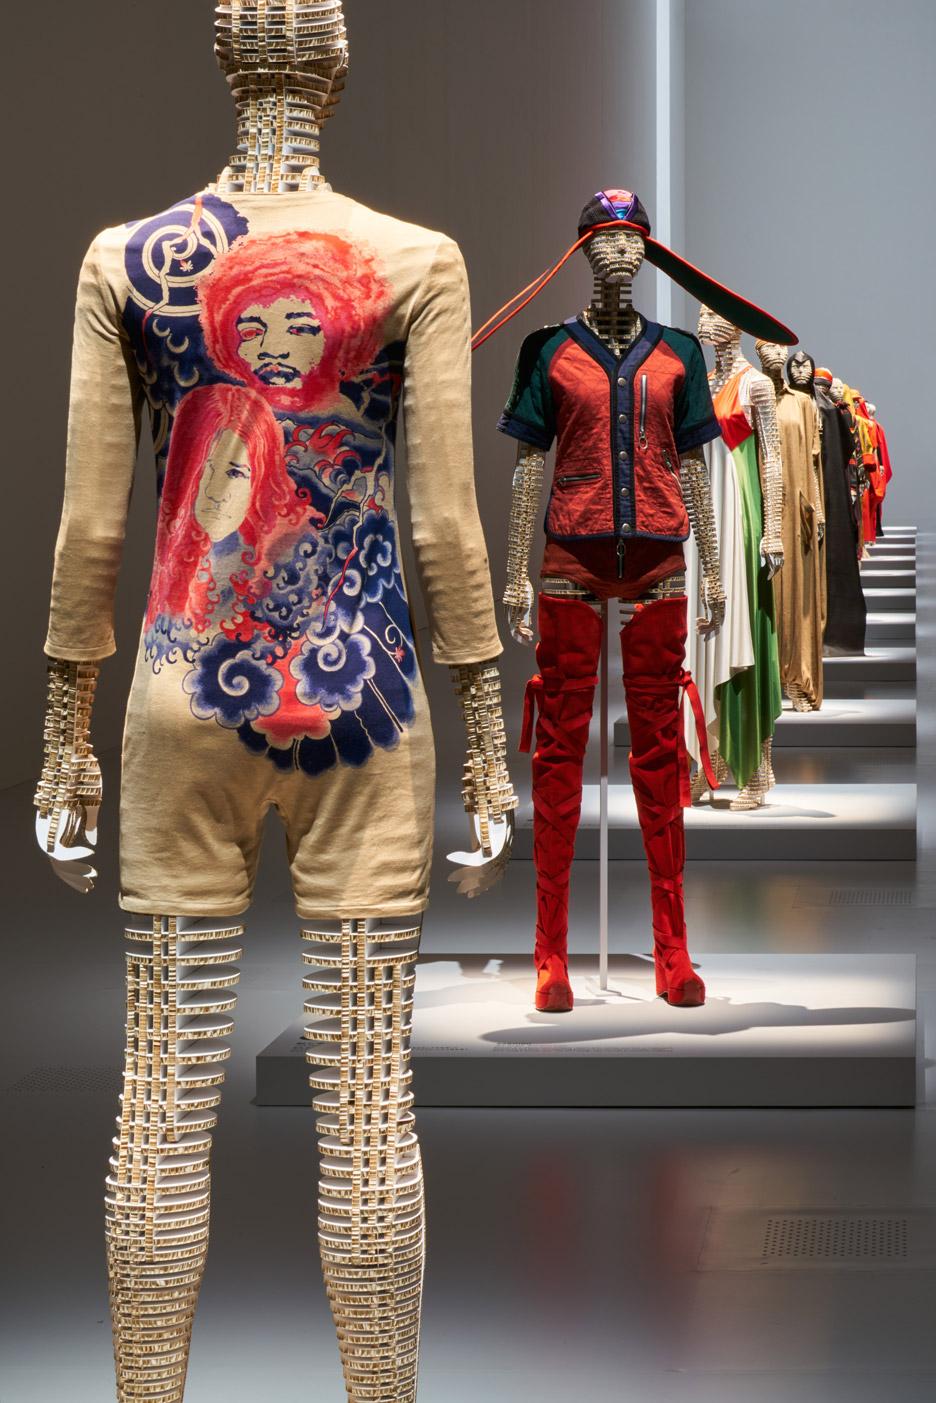 the-work-of-miyake-issey-exhibition-the-national-art-centre-tokyo_dezeen_936_0.jpg